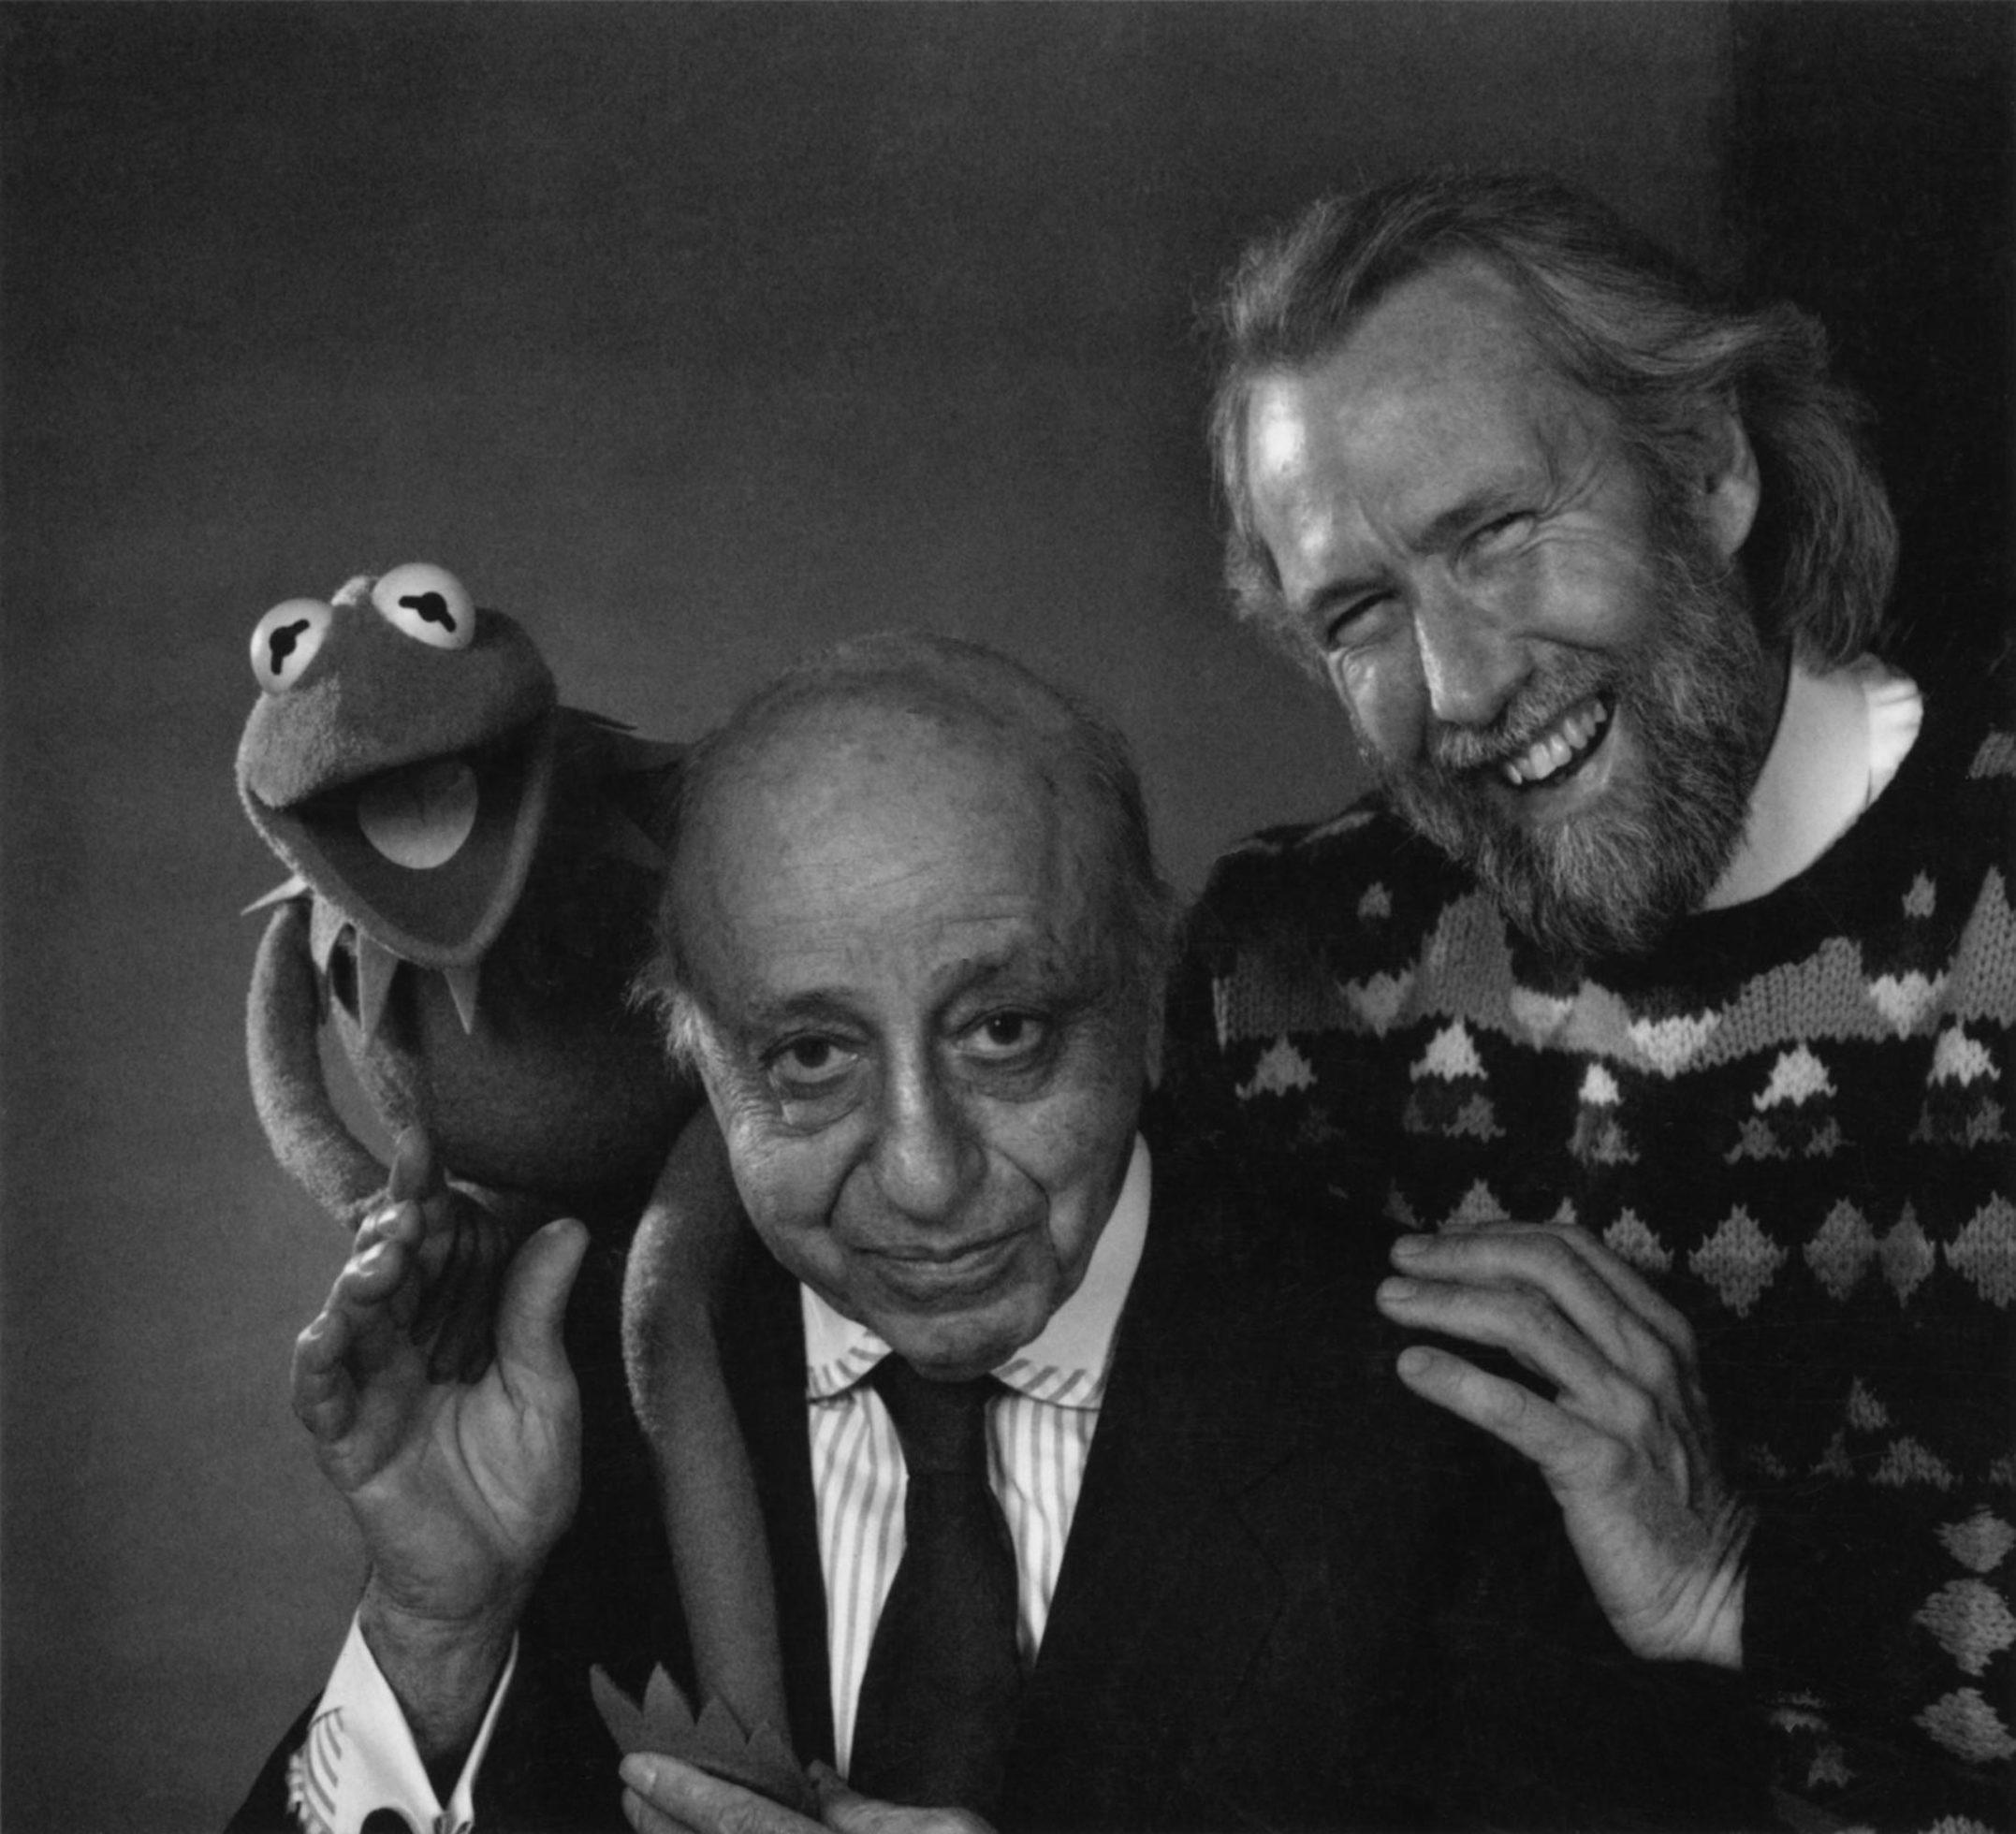 Jim Henson and Yousuf Karsh